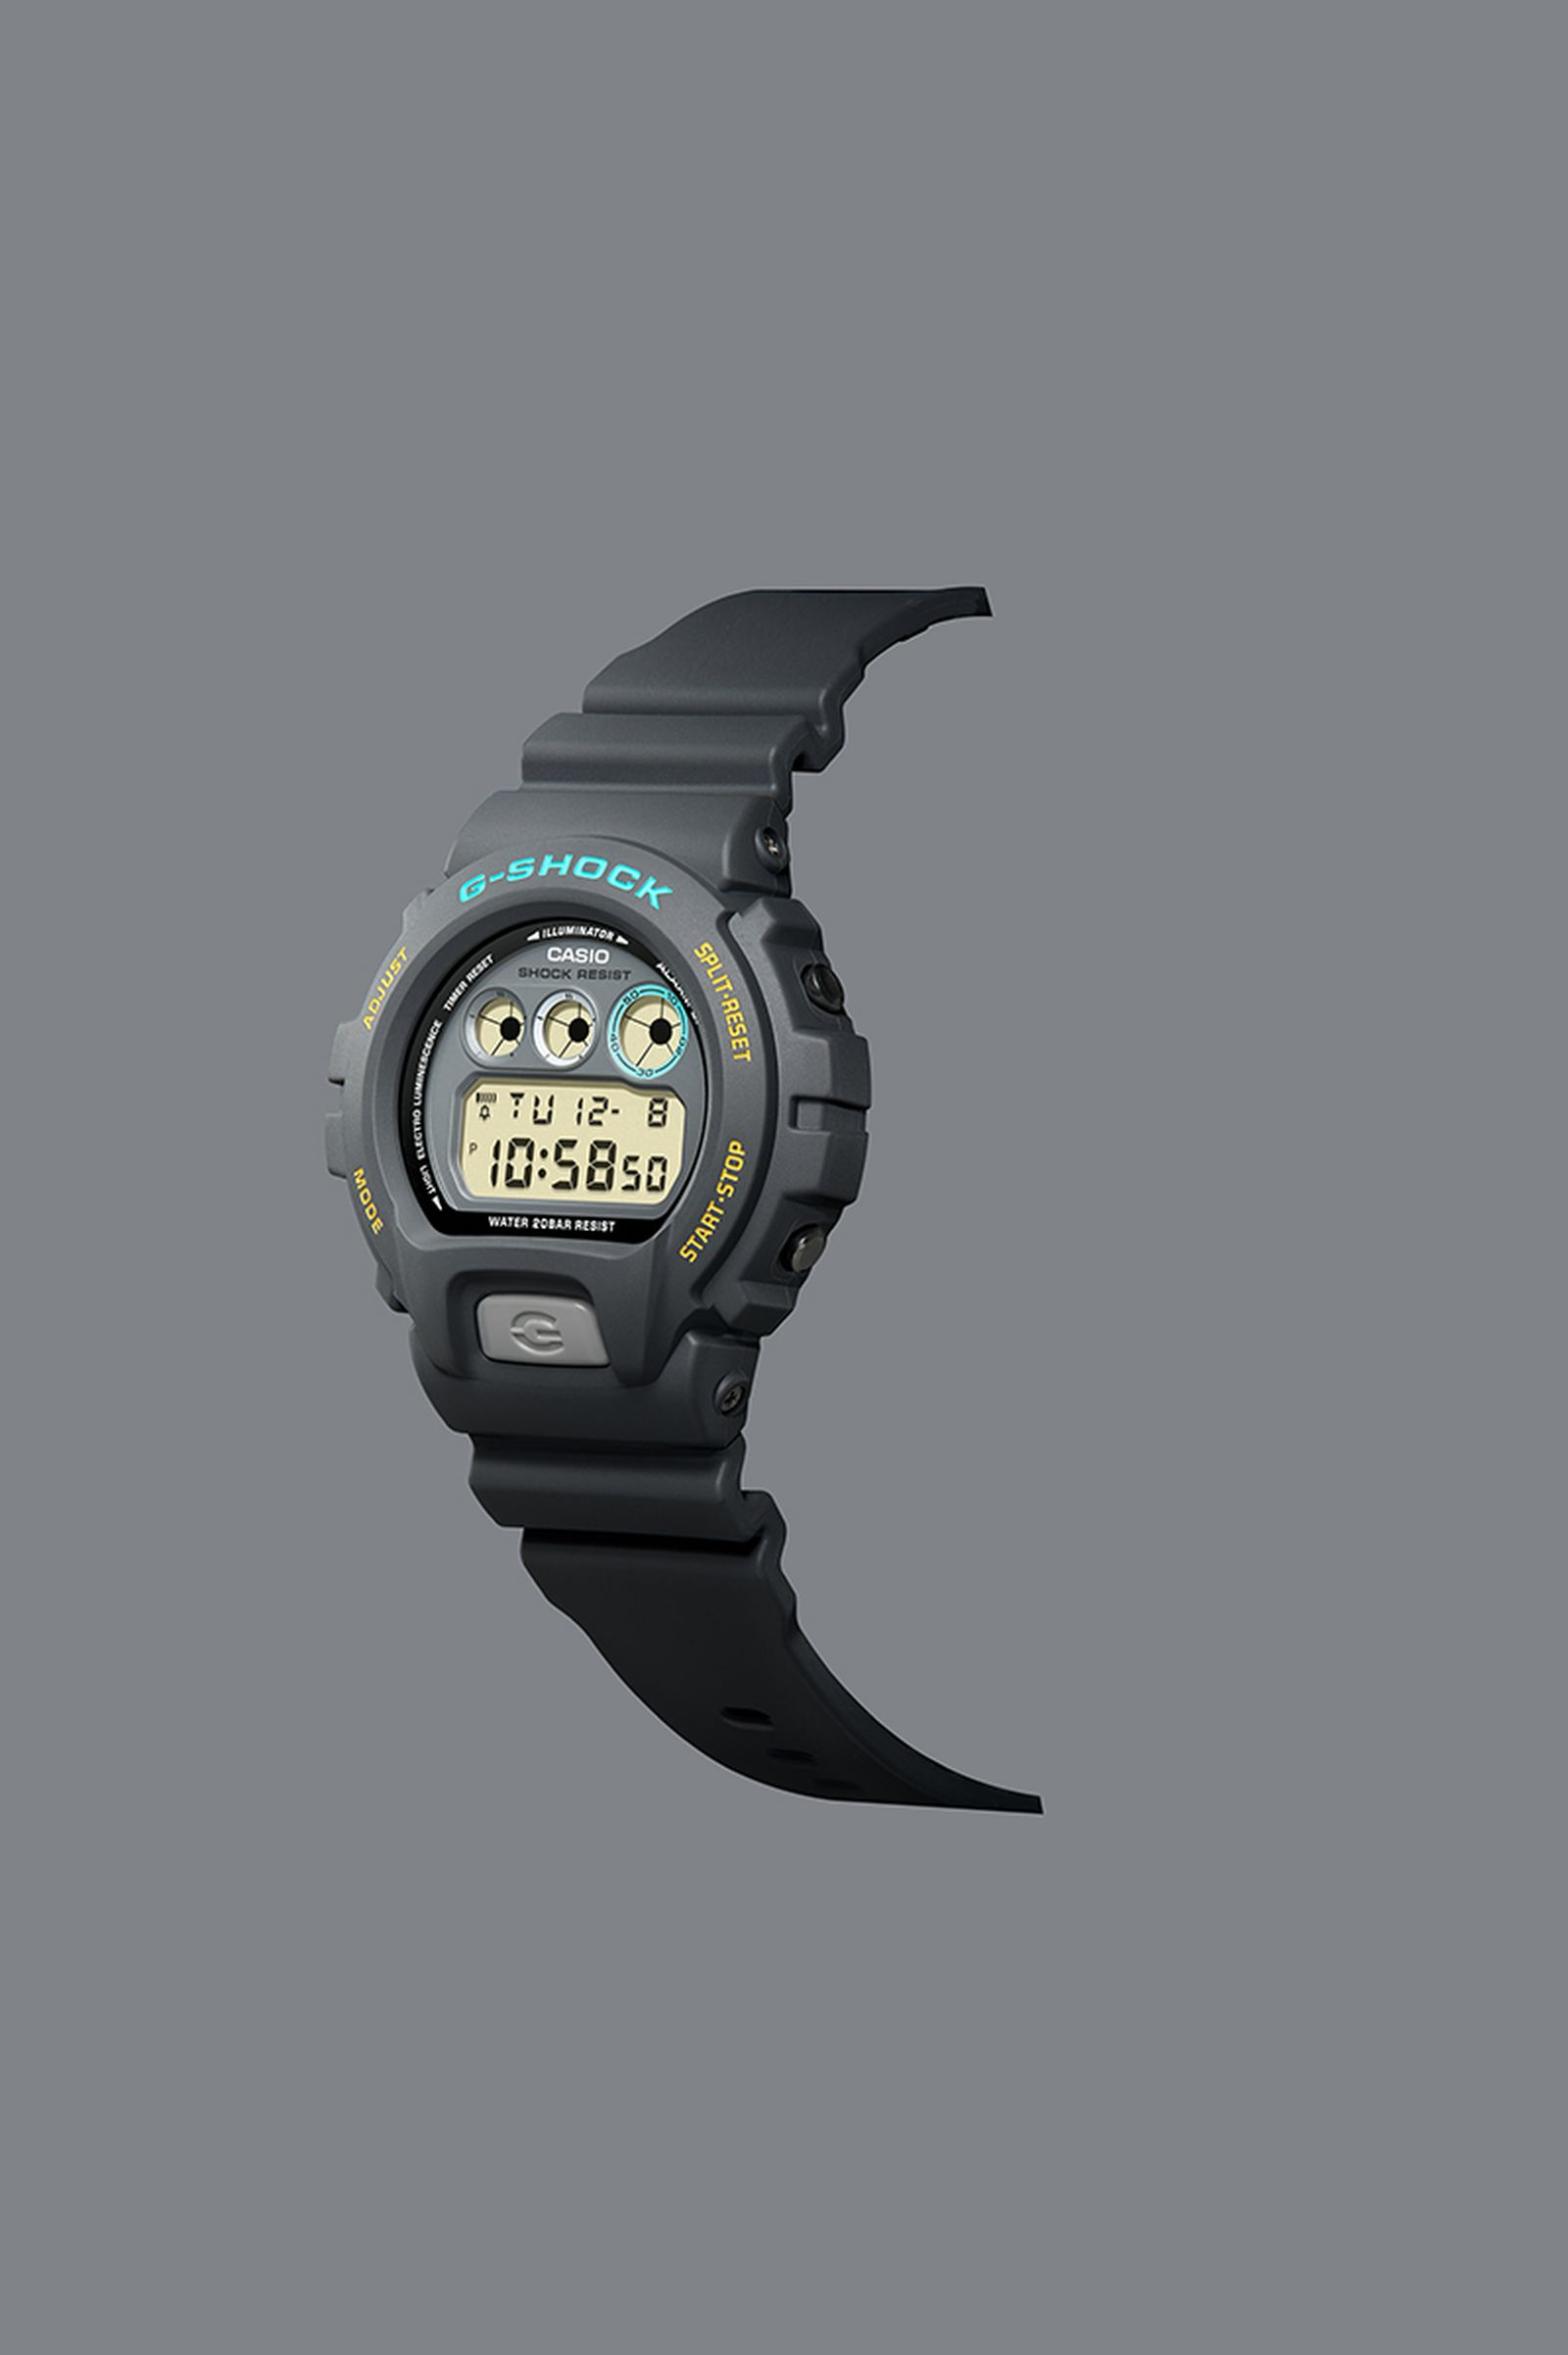 john-mayer-g-shock-ref-6900-03